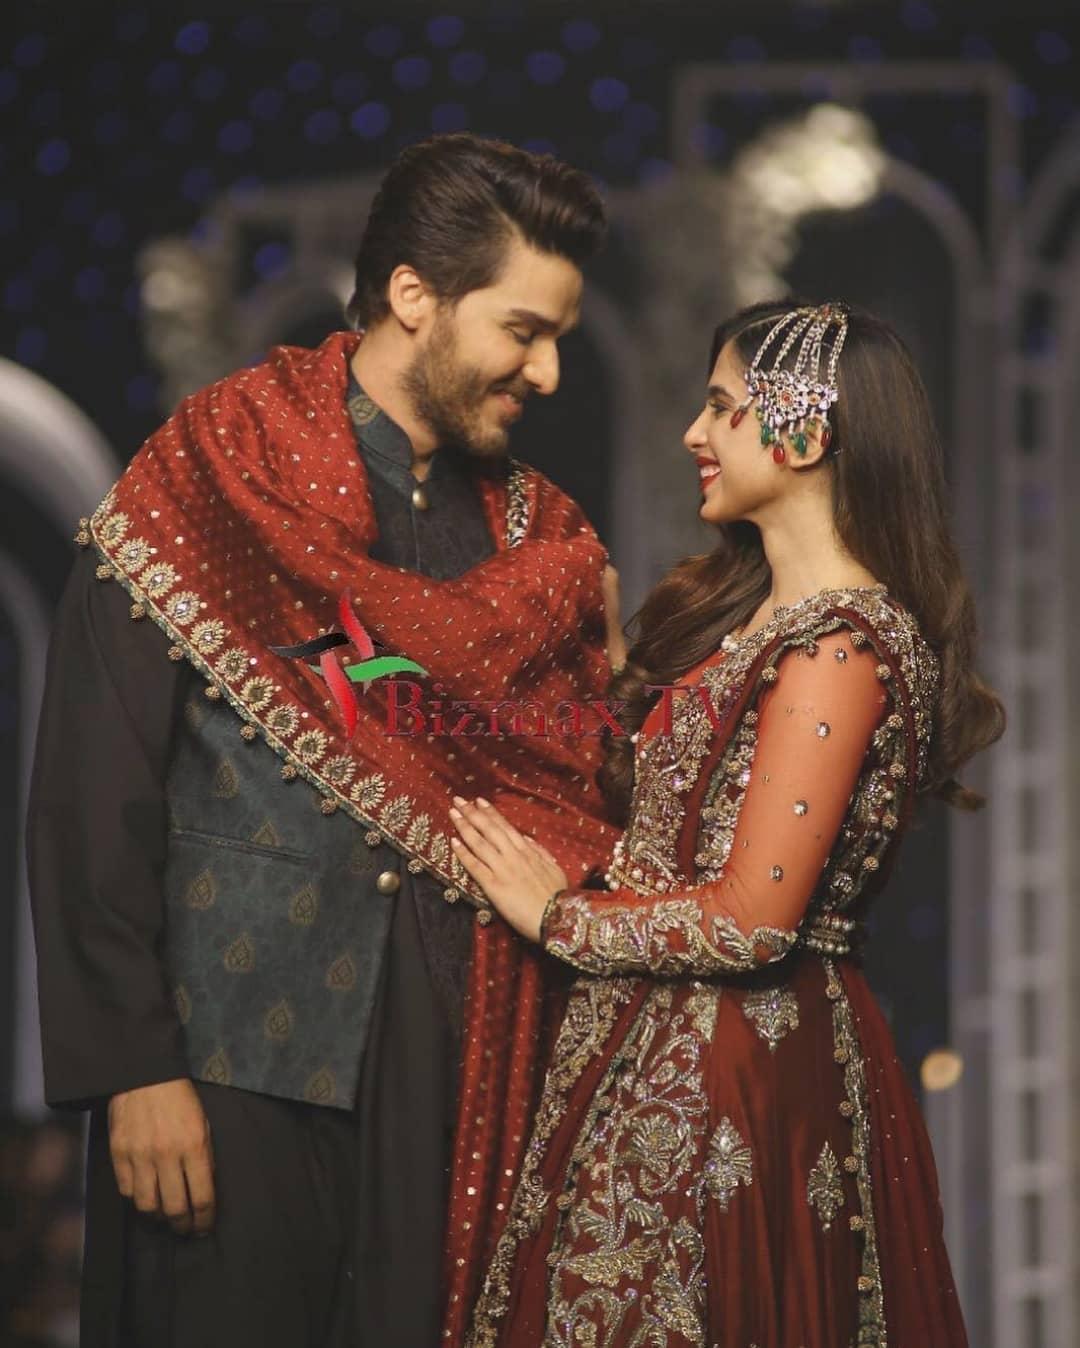 Beautiful Actors - Sonya Hussain and Ahsan Khan Walk on Ramp at PHBCW